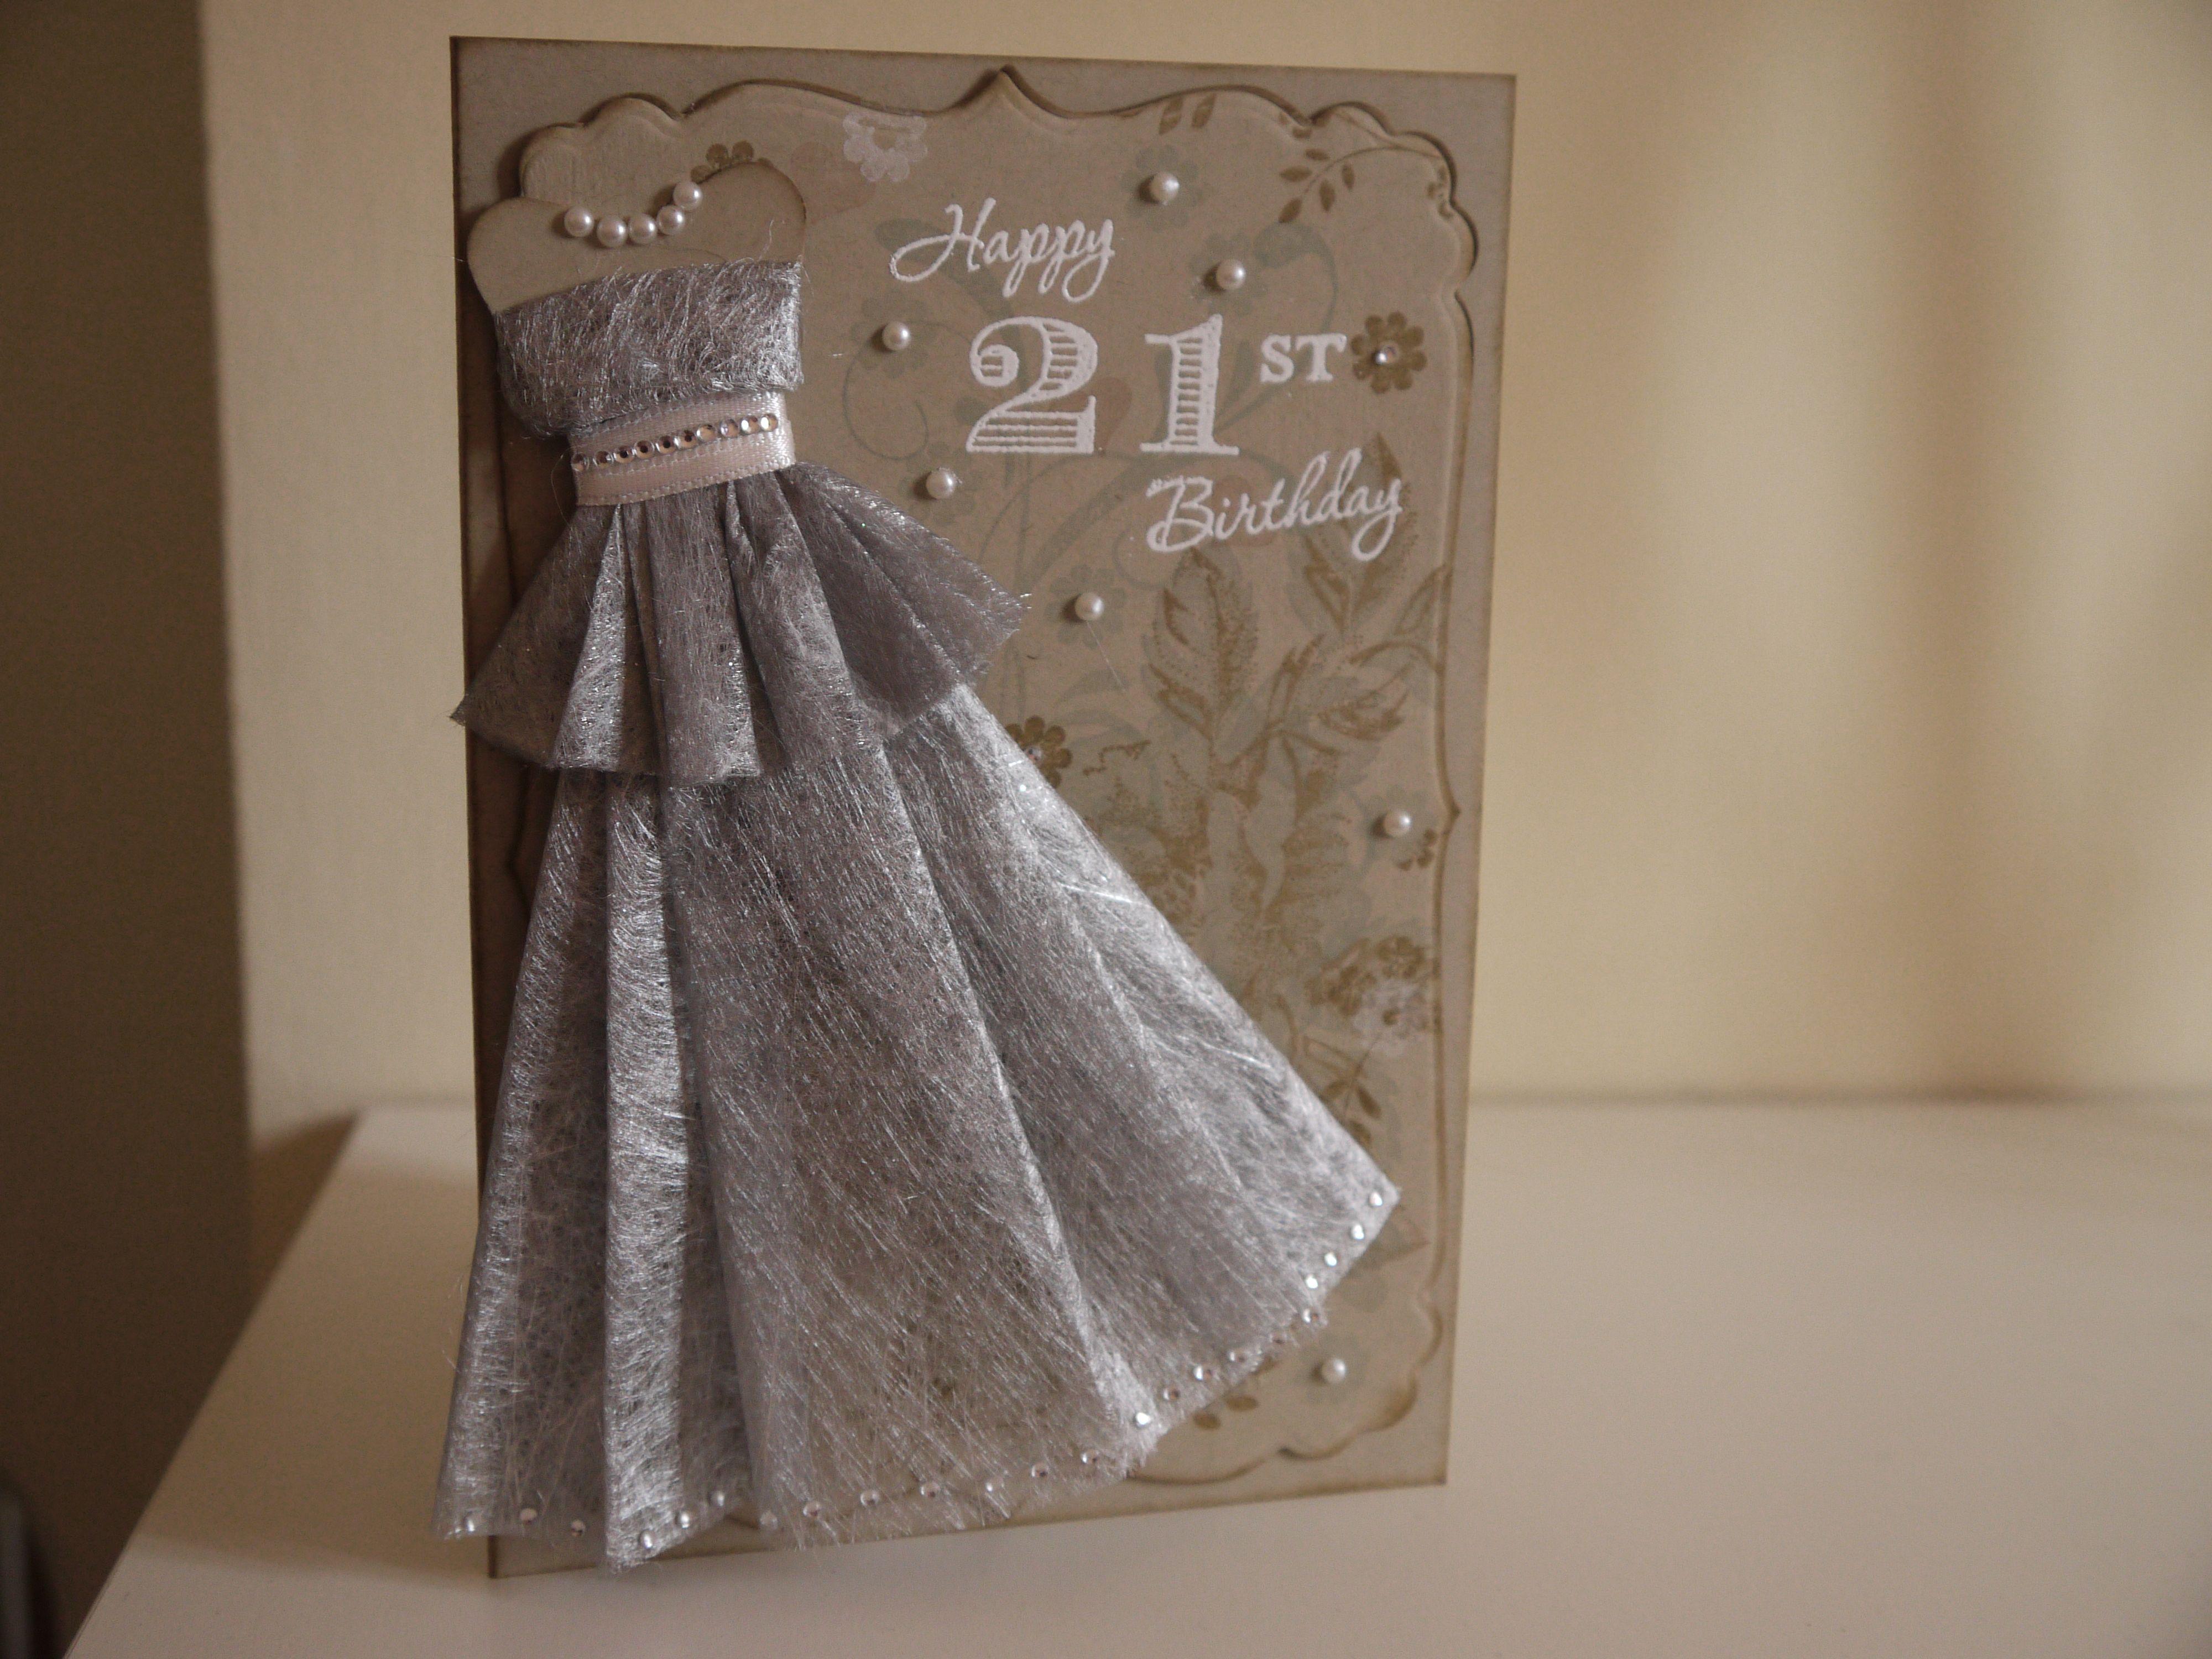 21st Birthday Card Making Ideas Part - 38: Girly 21st Birthday Card, Elegant Dress Form